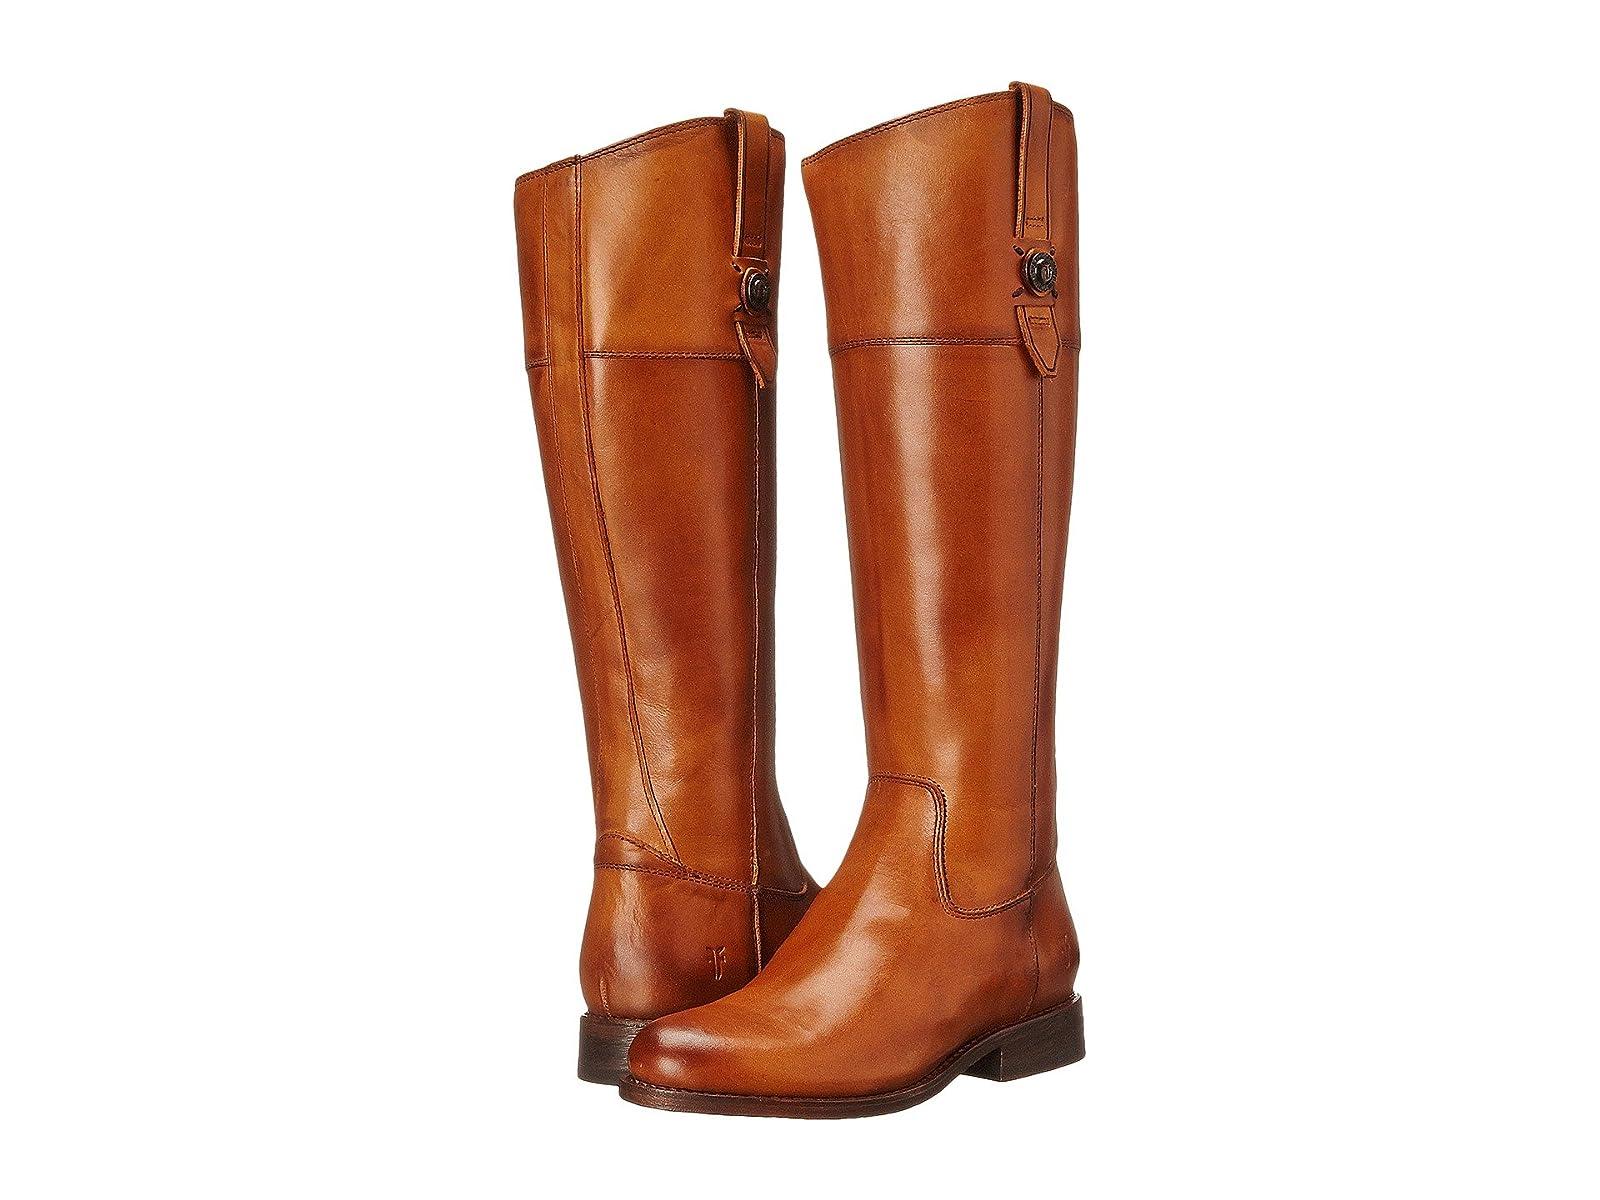 Frye Jayden Button TallCheap and distinctive eye-catching shoes